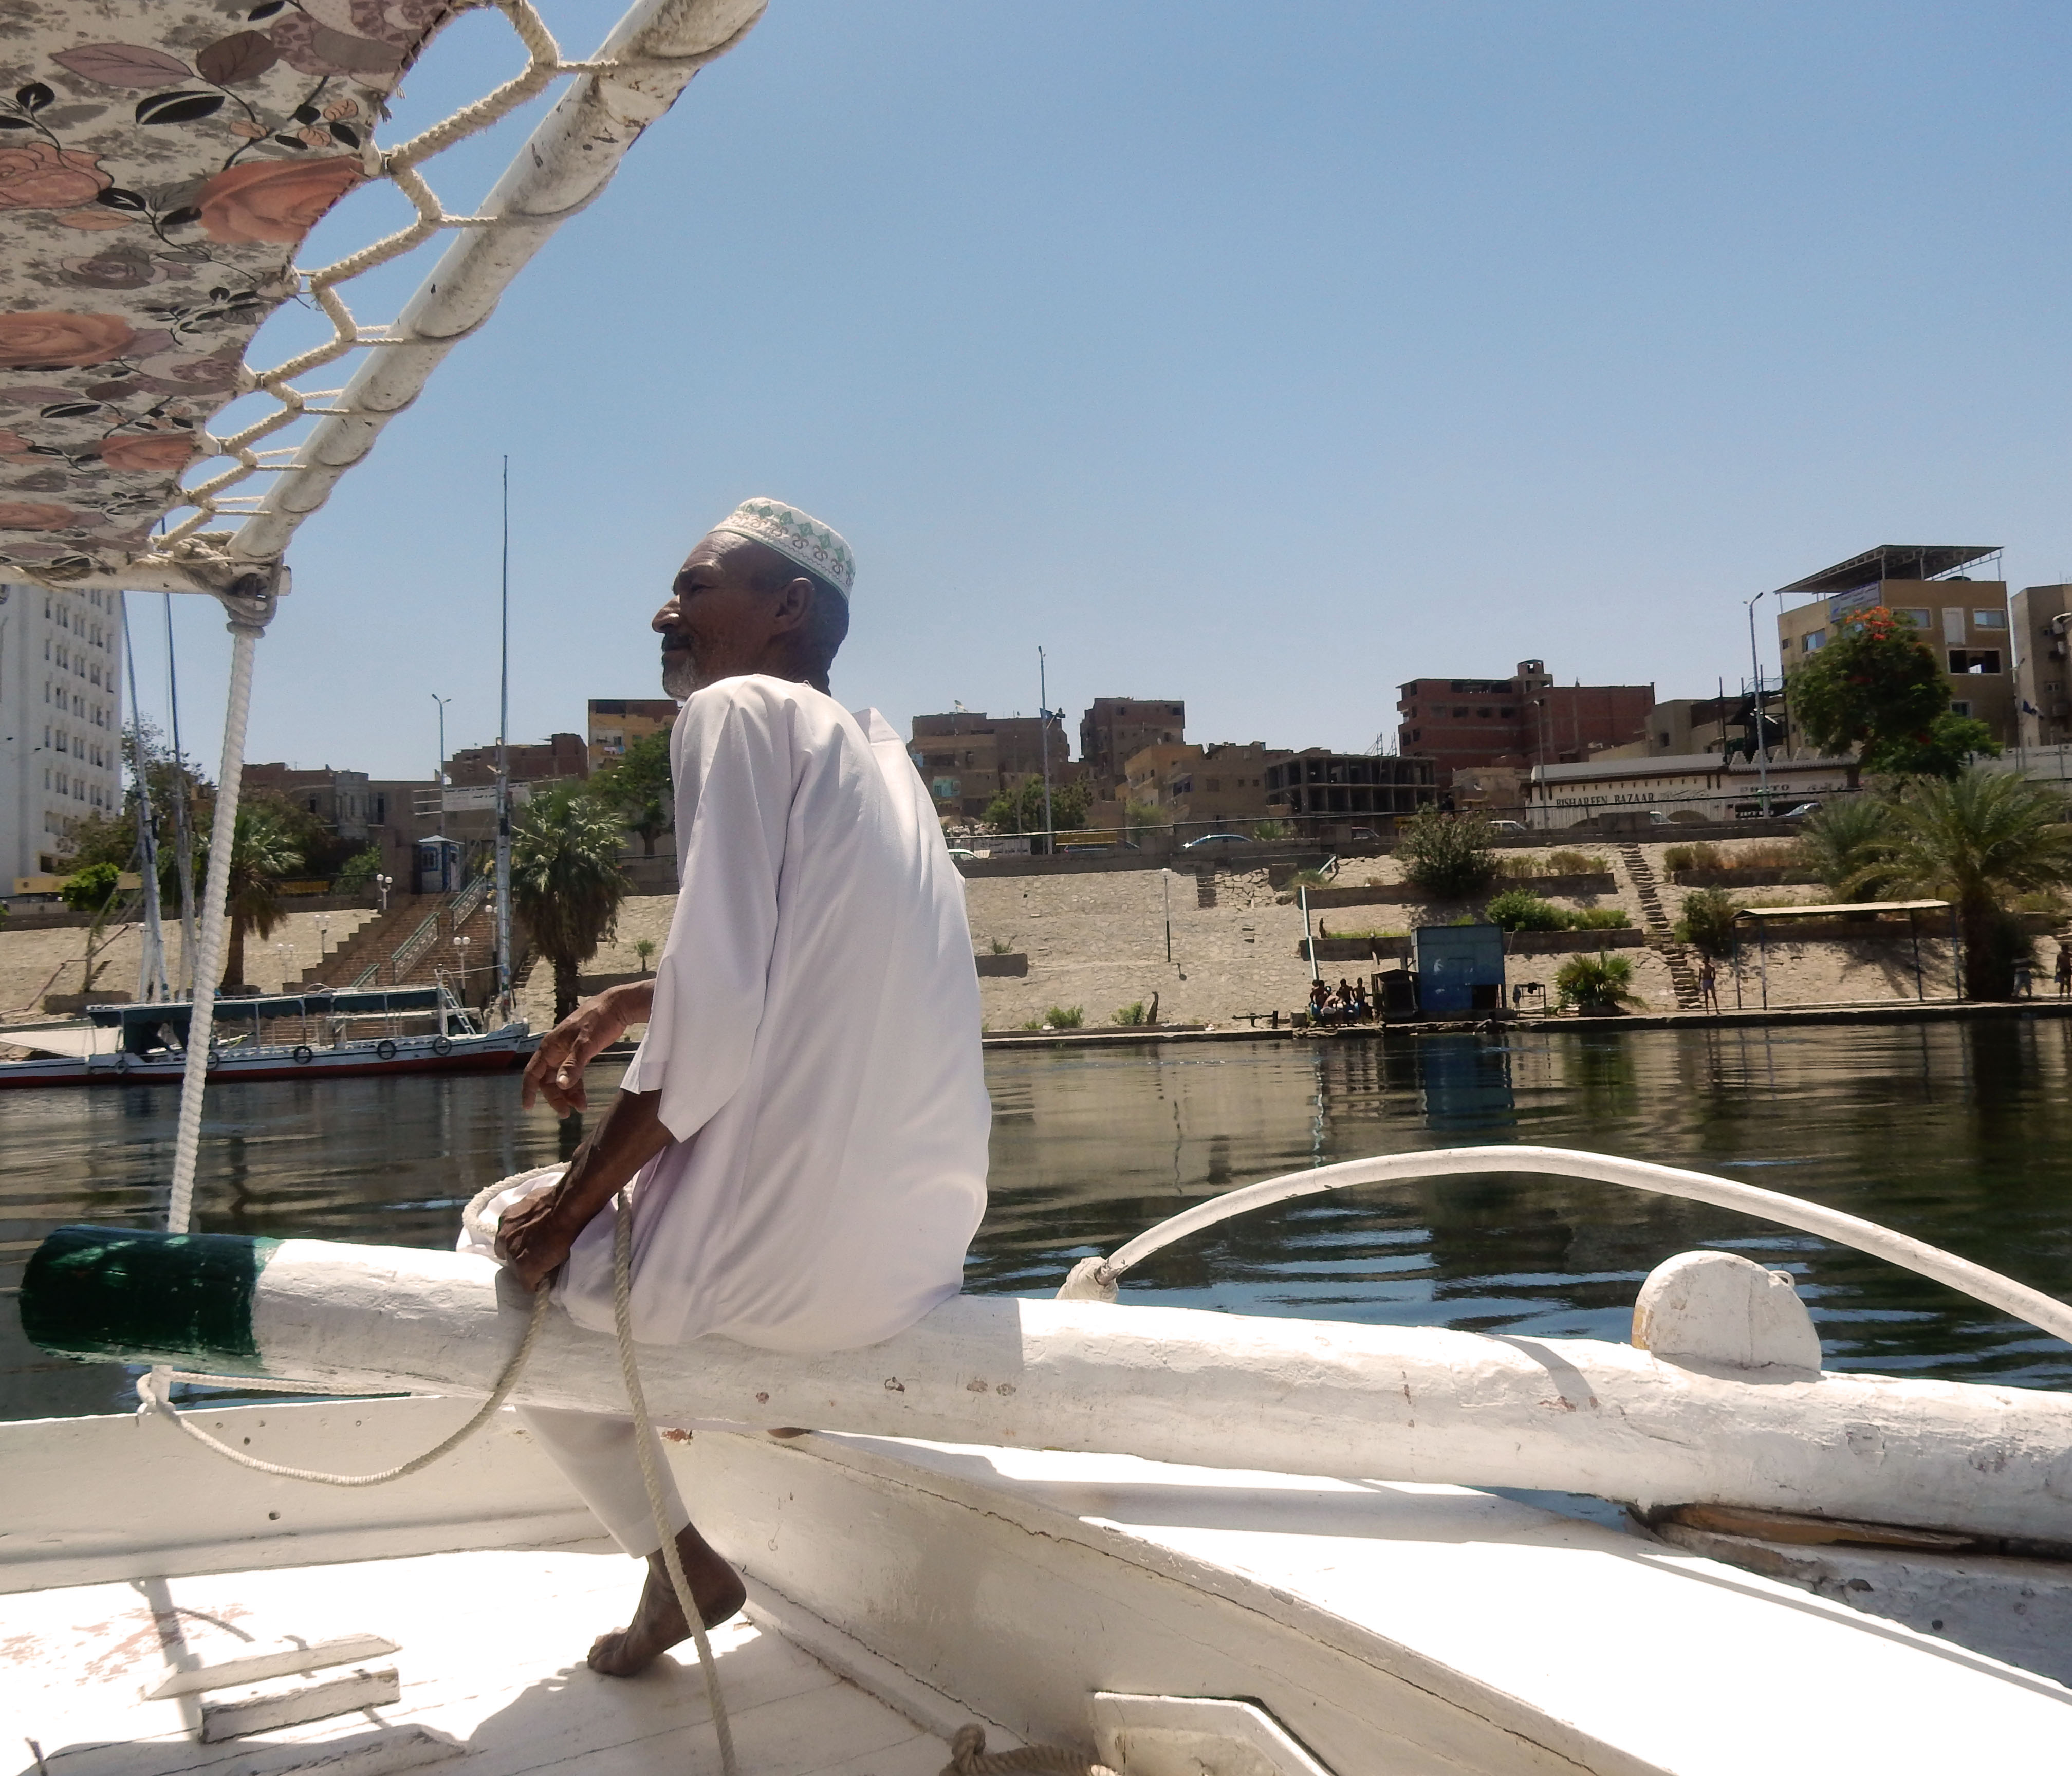 mia und ich blog Nil Feluke Schiff Segelschiff Assuan Ägypten Egypt